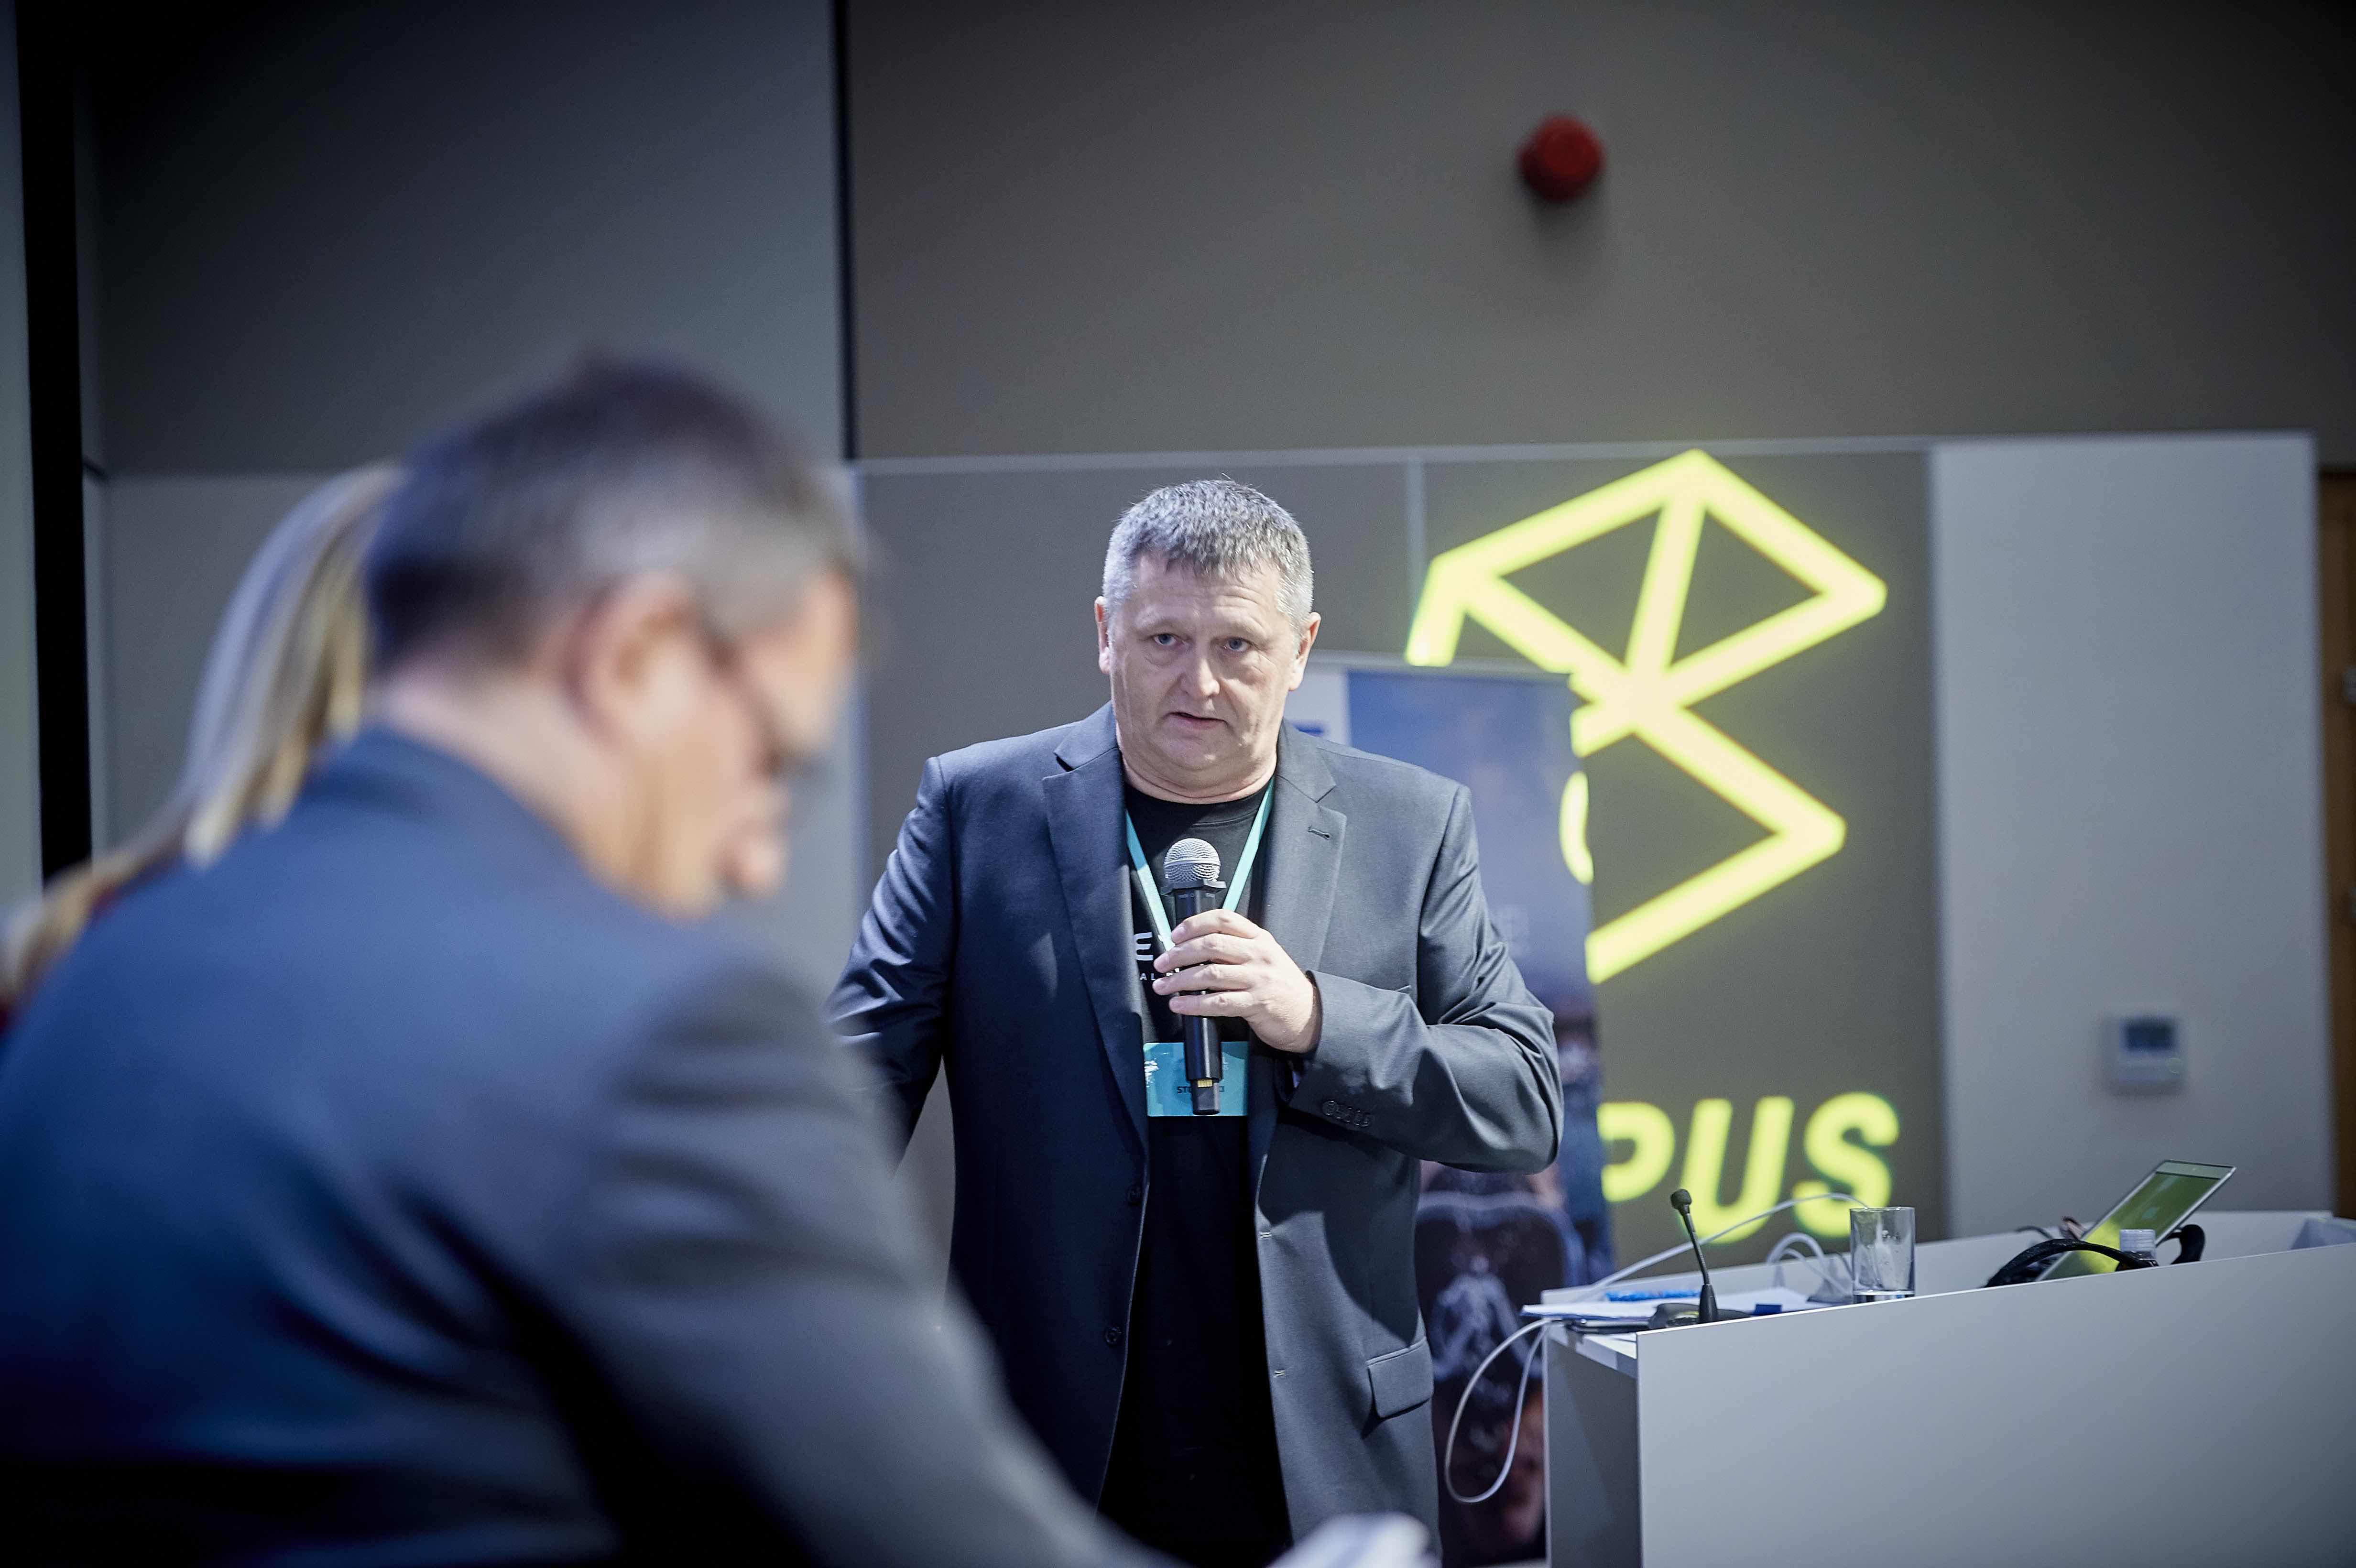 Digital Champions Norbert Biedrzycki